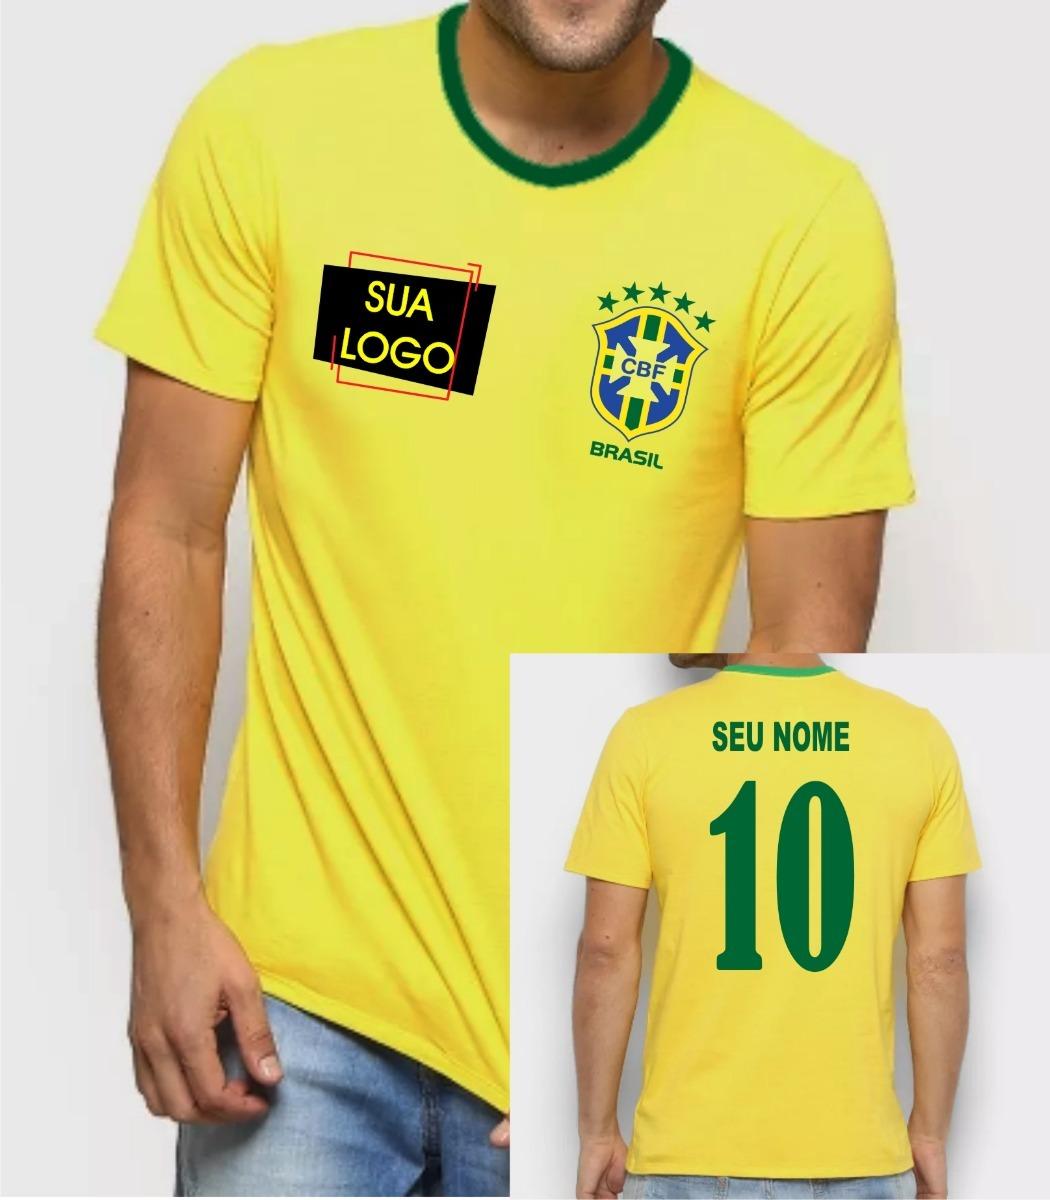 b7c96be5238ee camiseta camisa brasil copa do mundo russia kit claydson201. Carregando  zoom.